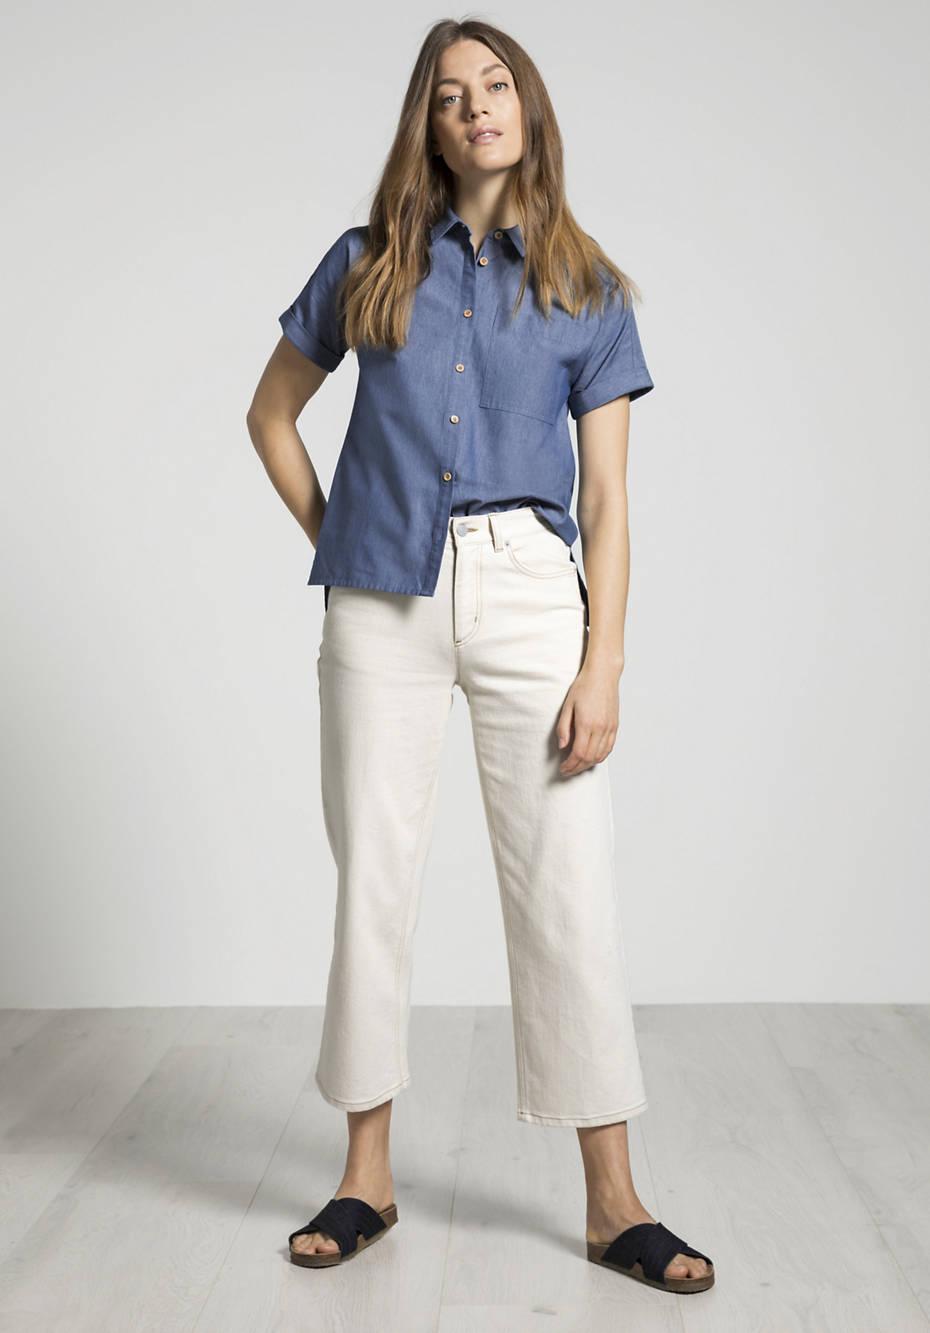 Shirt blouse made of banana fibers with organic cotton